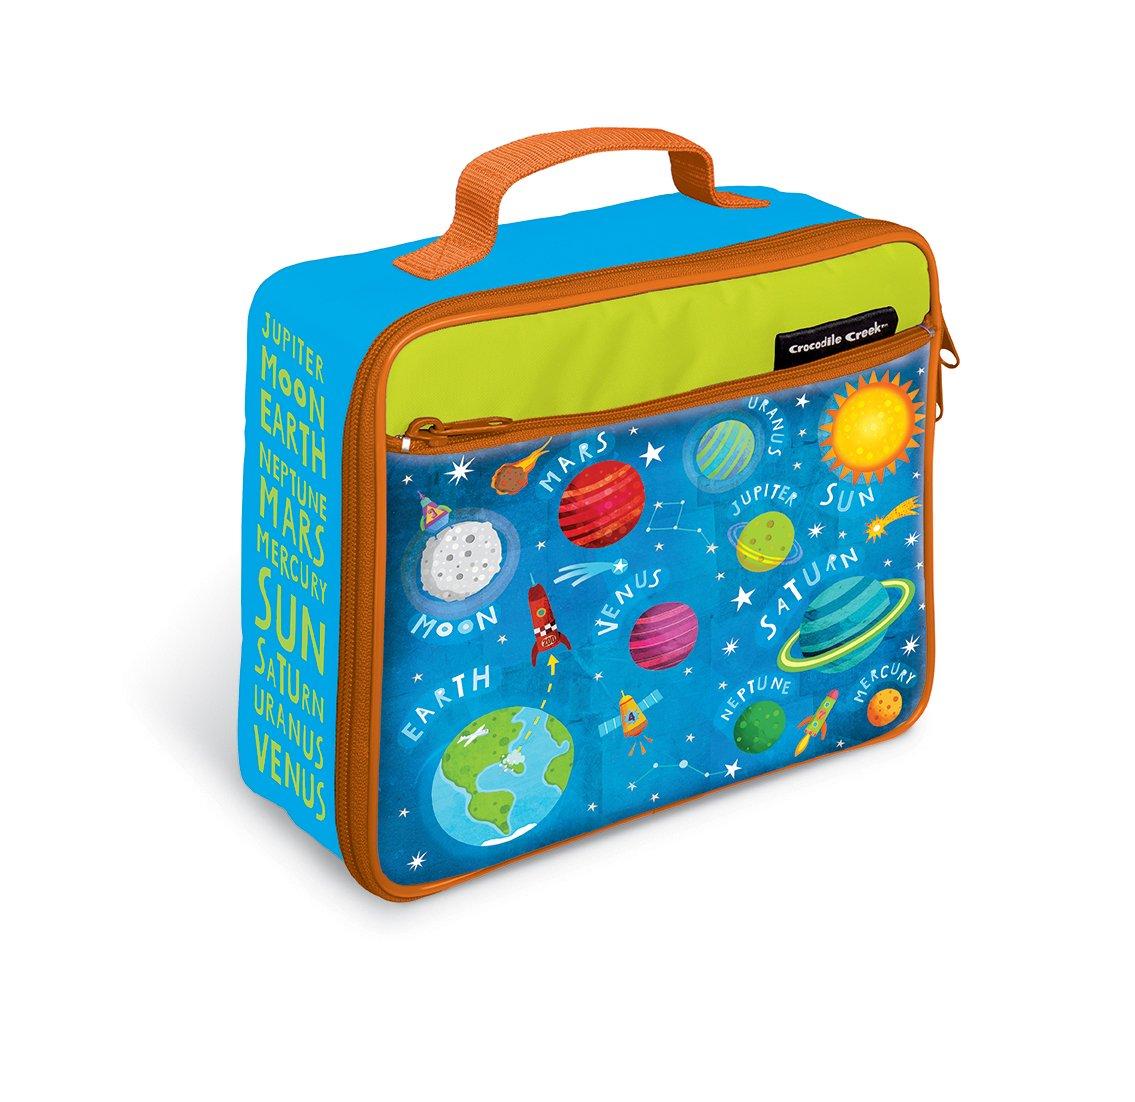 Crocodile Creek Eco Kids Solar System Insulated Kids' Lunchbox with Handle Kids', 10''